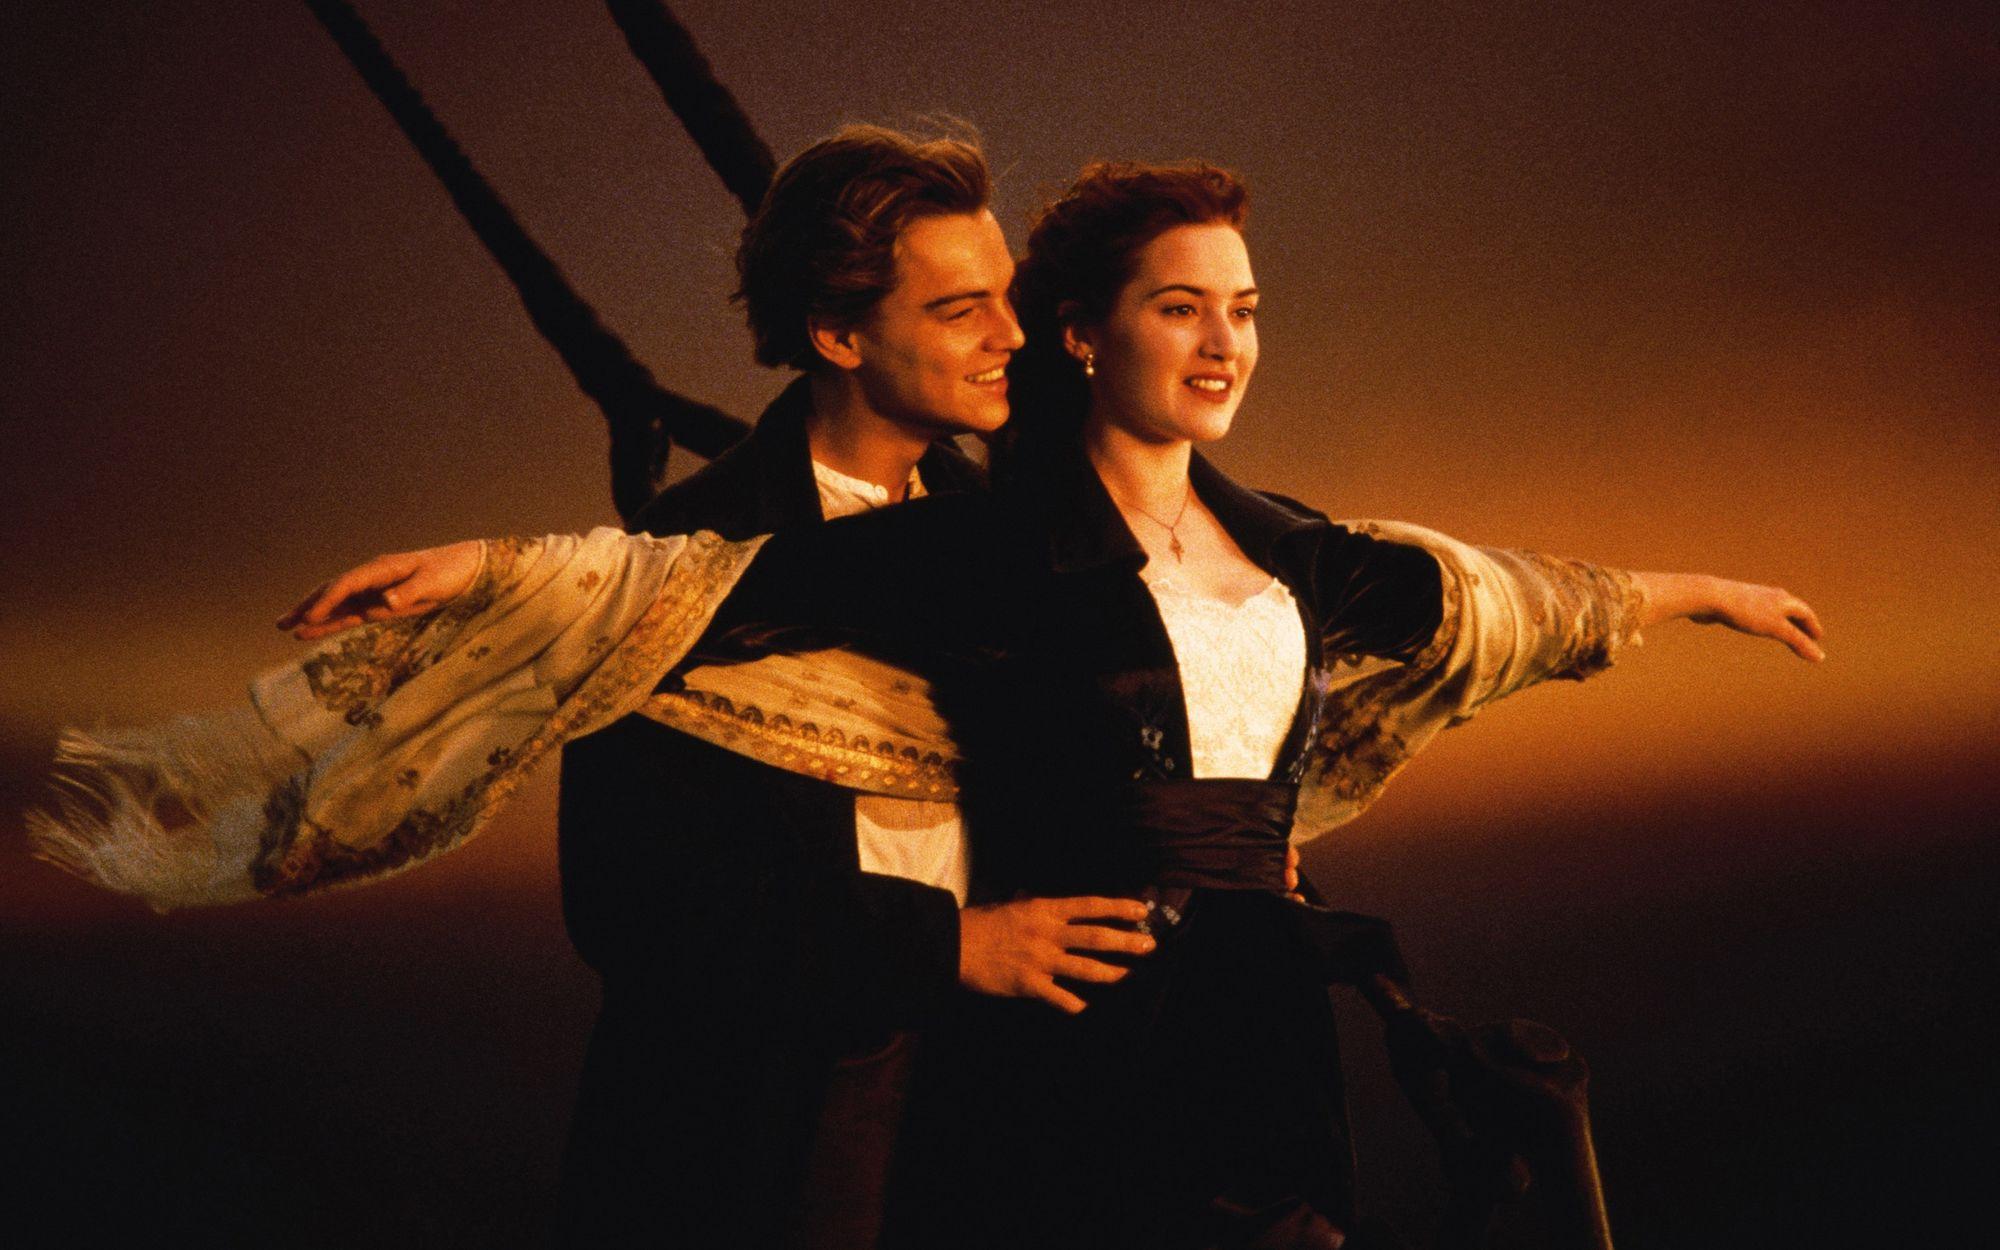 Титаник, фильм, кадр